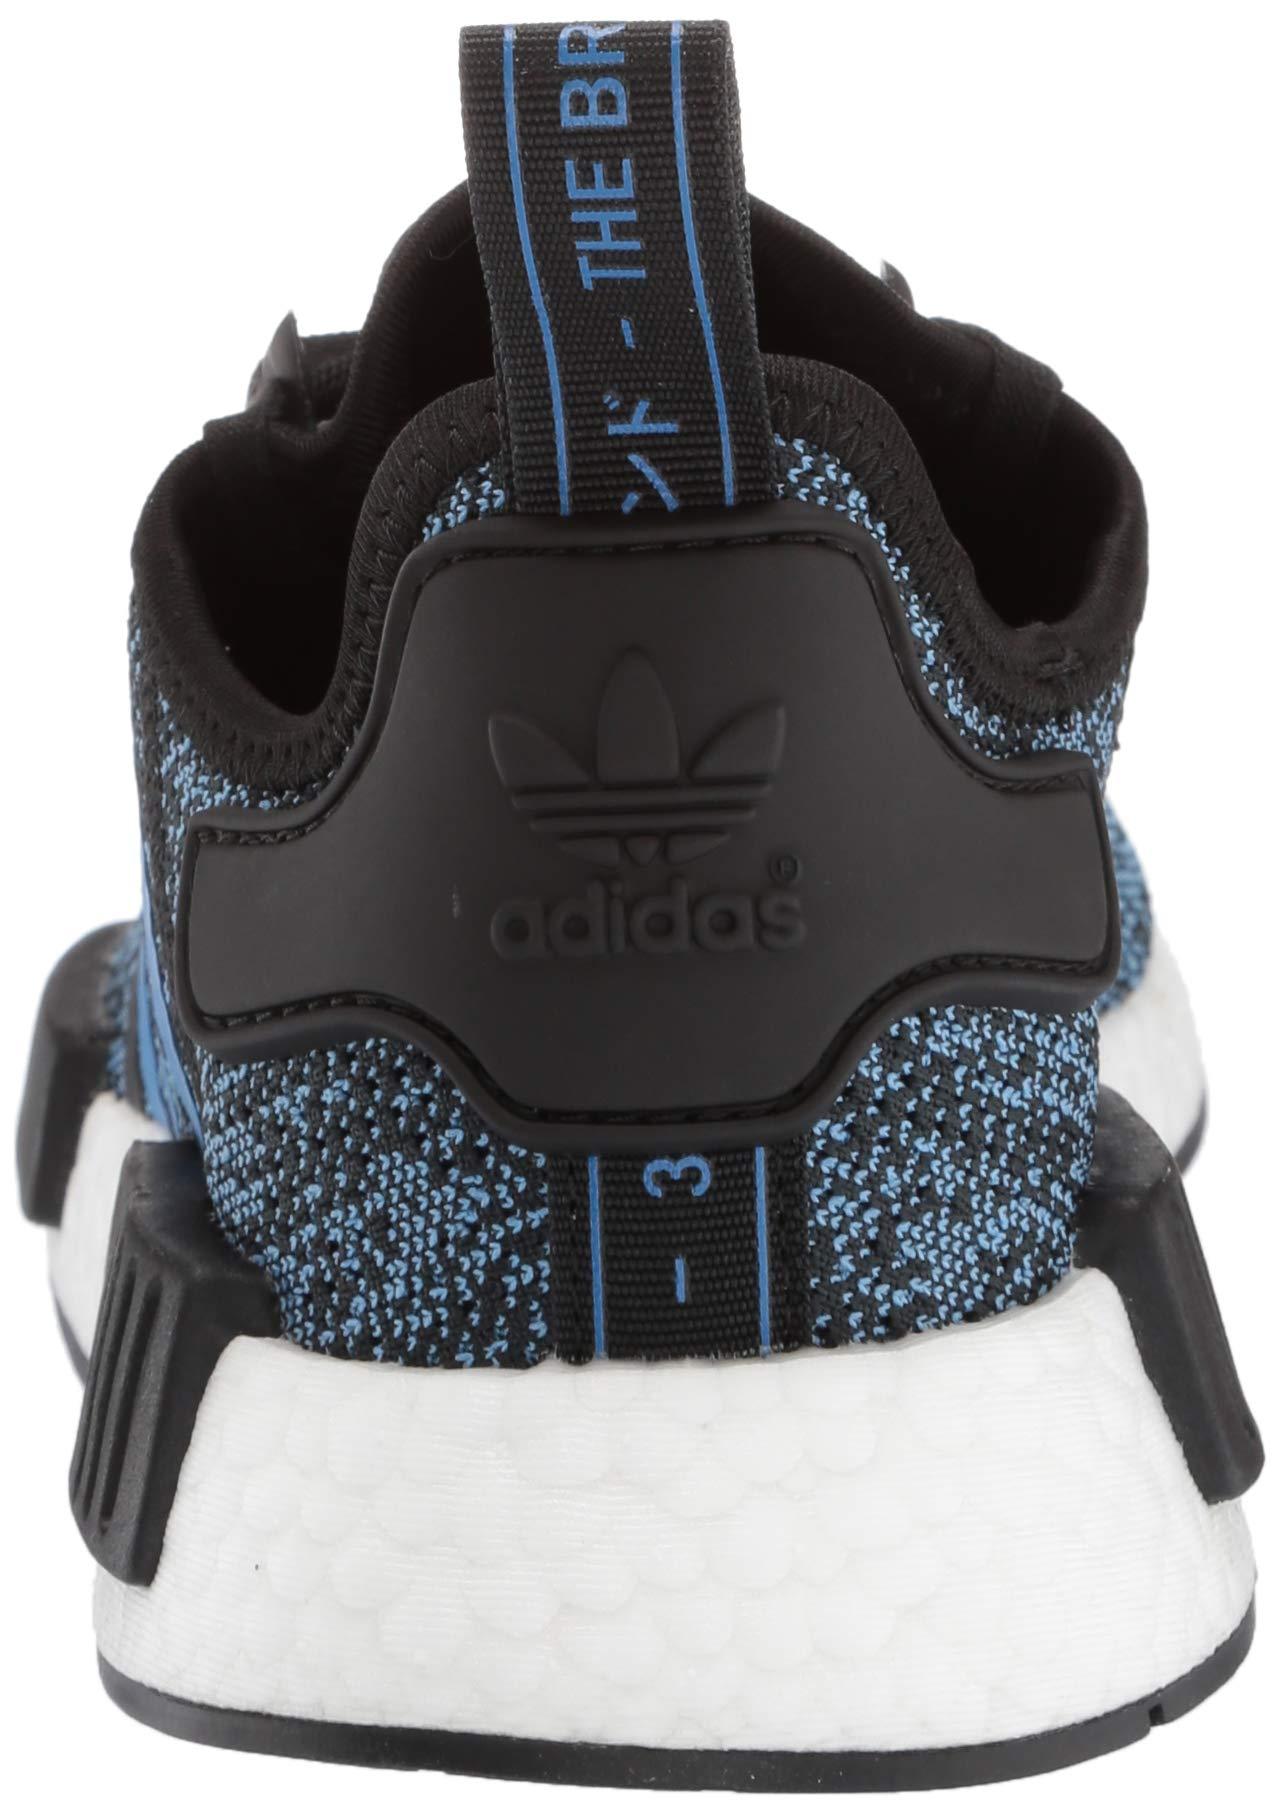 adidas Originals NMD_R1 Running Shoe True Blue/Utility Black, 3.5 M US Big Kid by adidas Originals (Image #2)